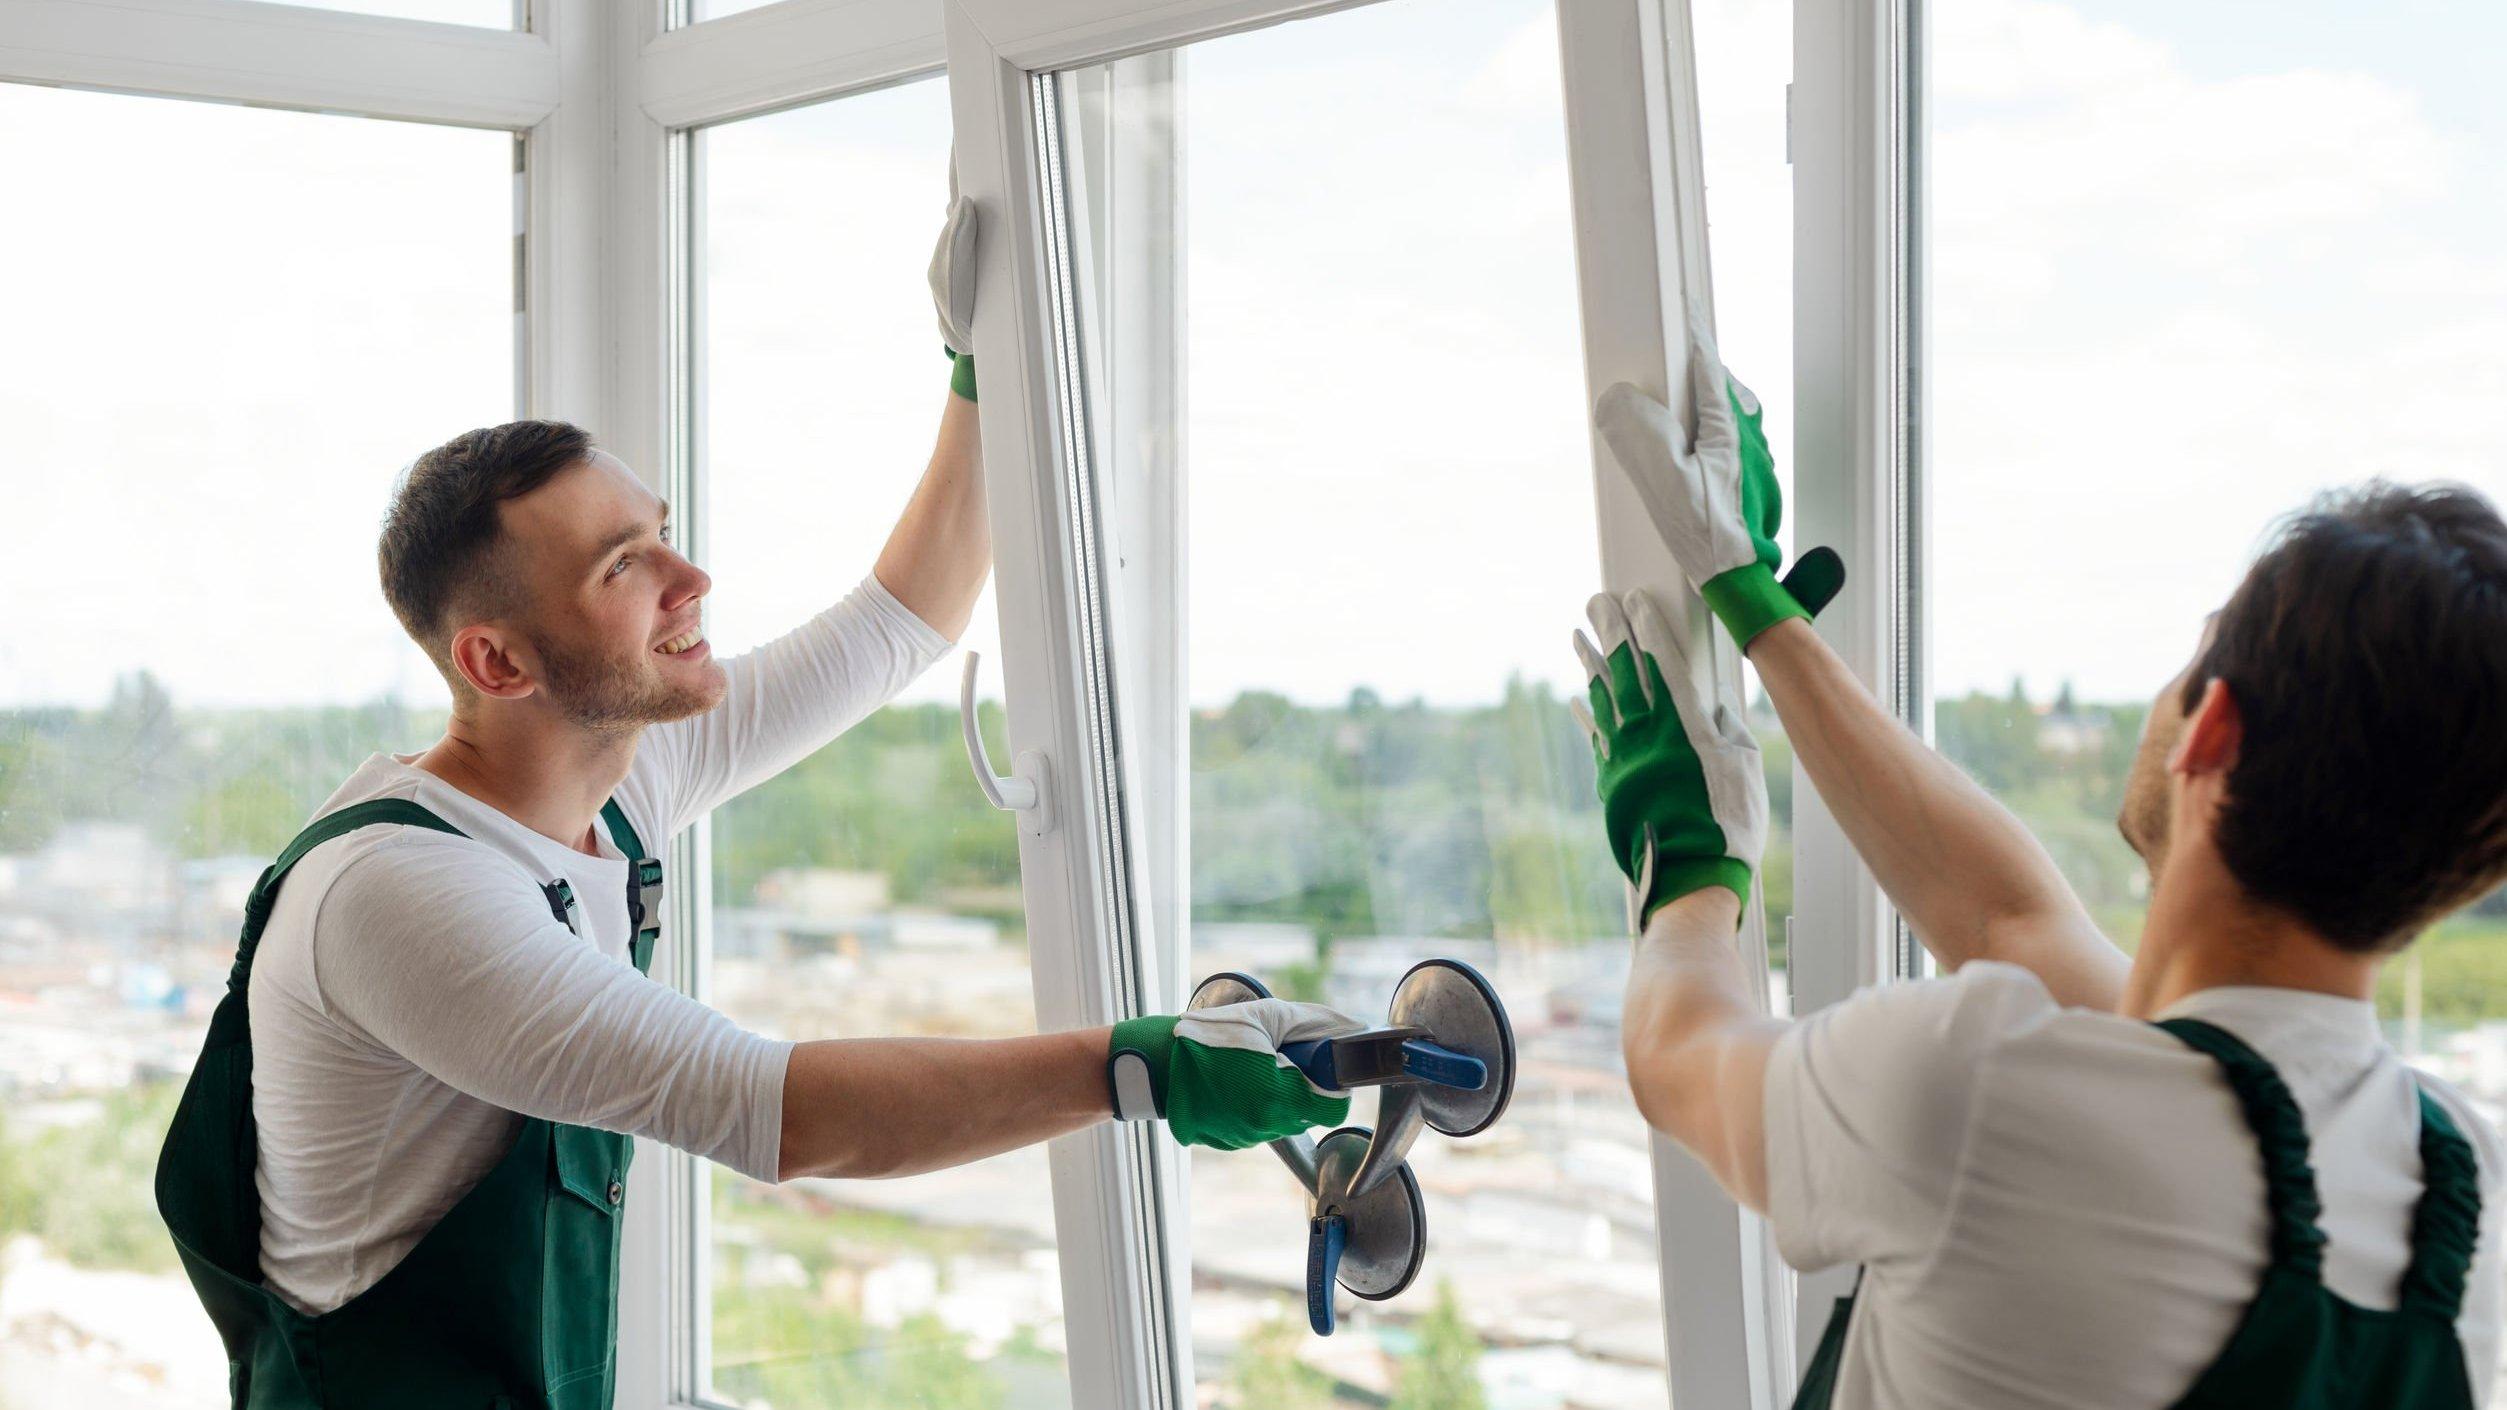 Homens instalando janela de vidro.